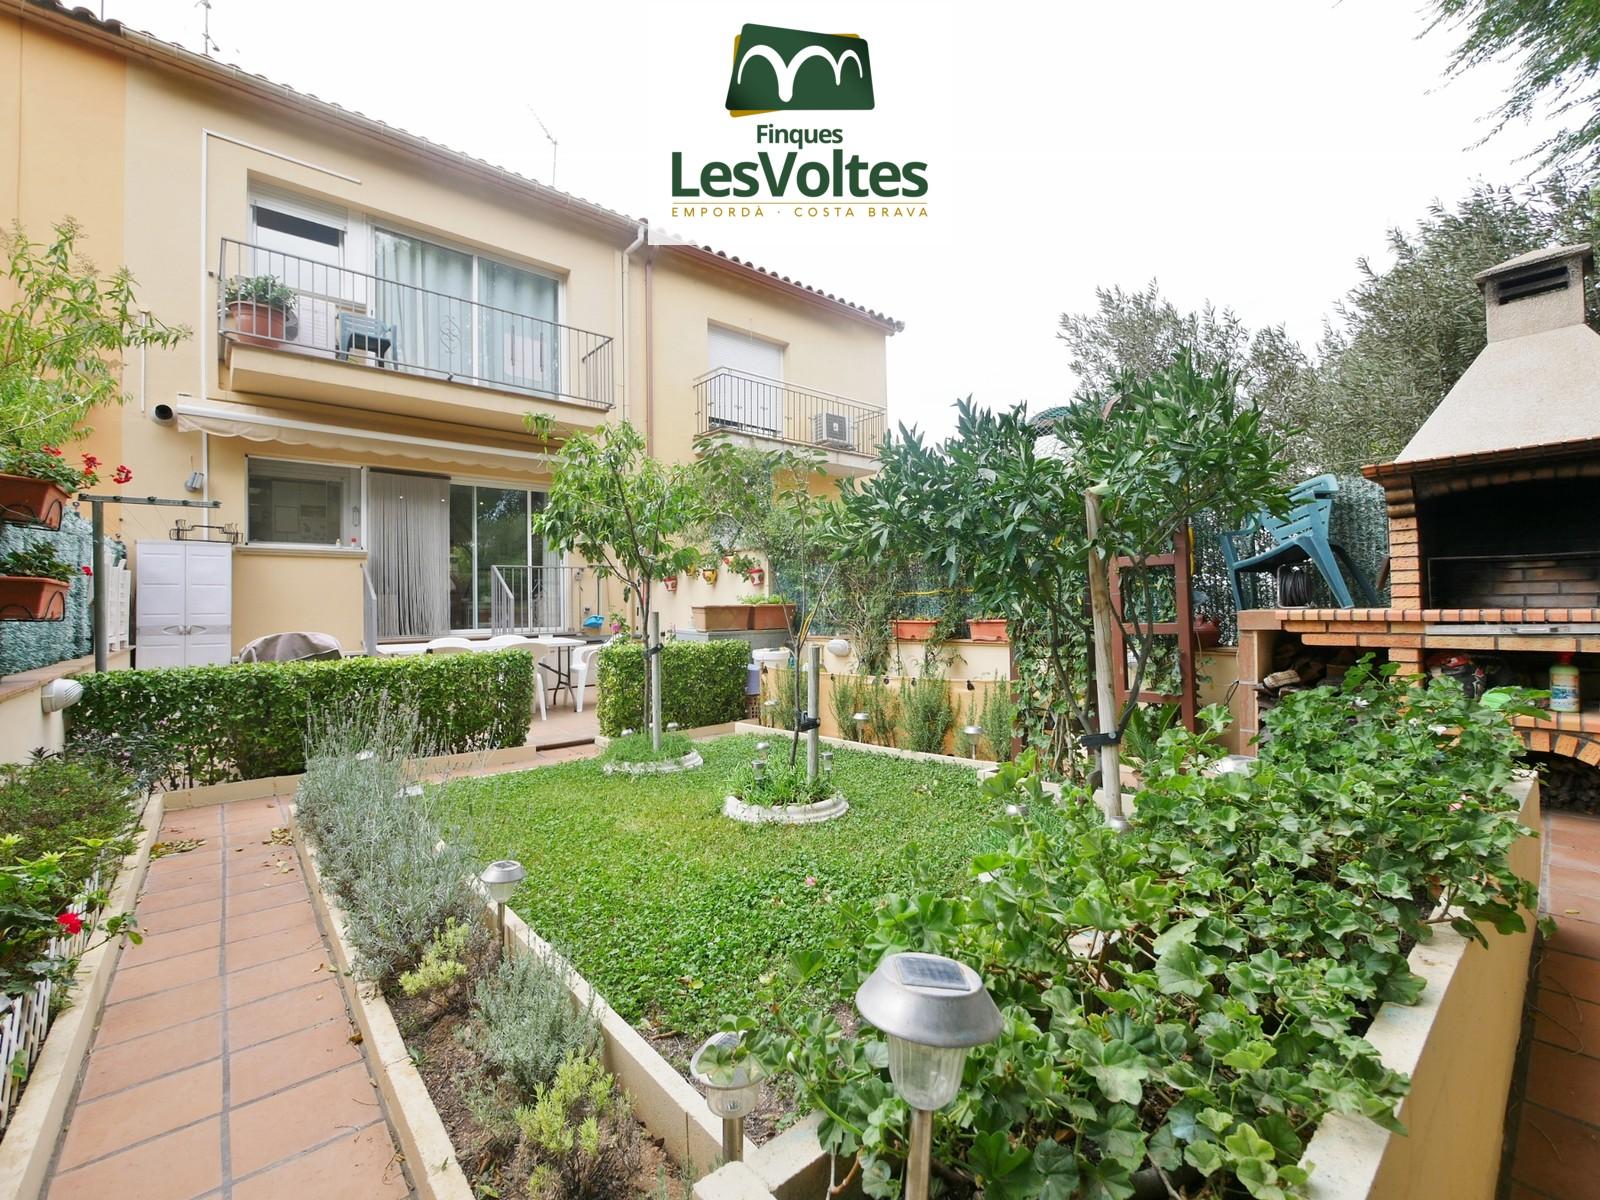 Magnífica casa amb jardí i garatge en venda a Palafrugell. Zona residencial tranquil·la.